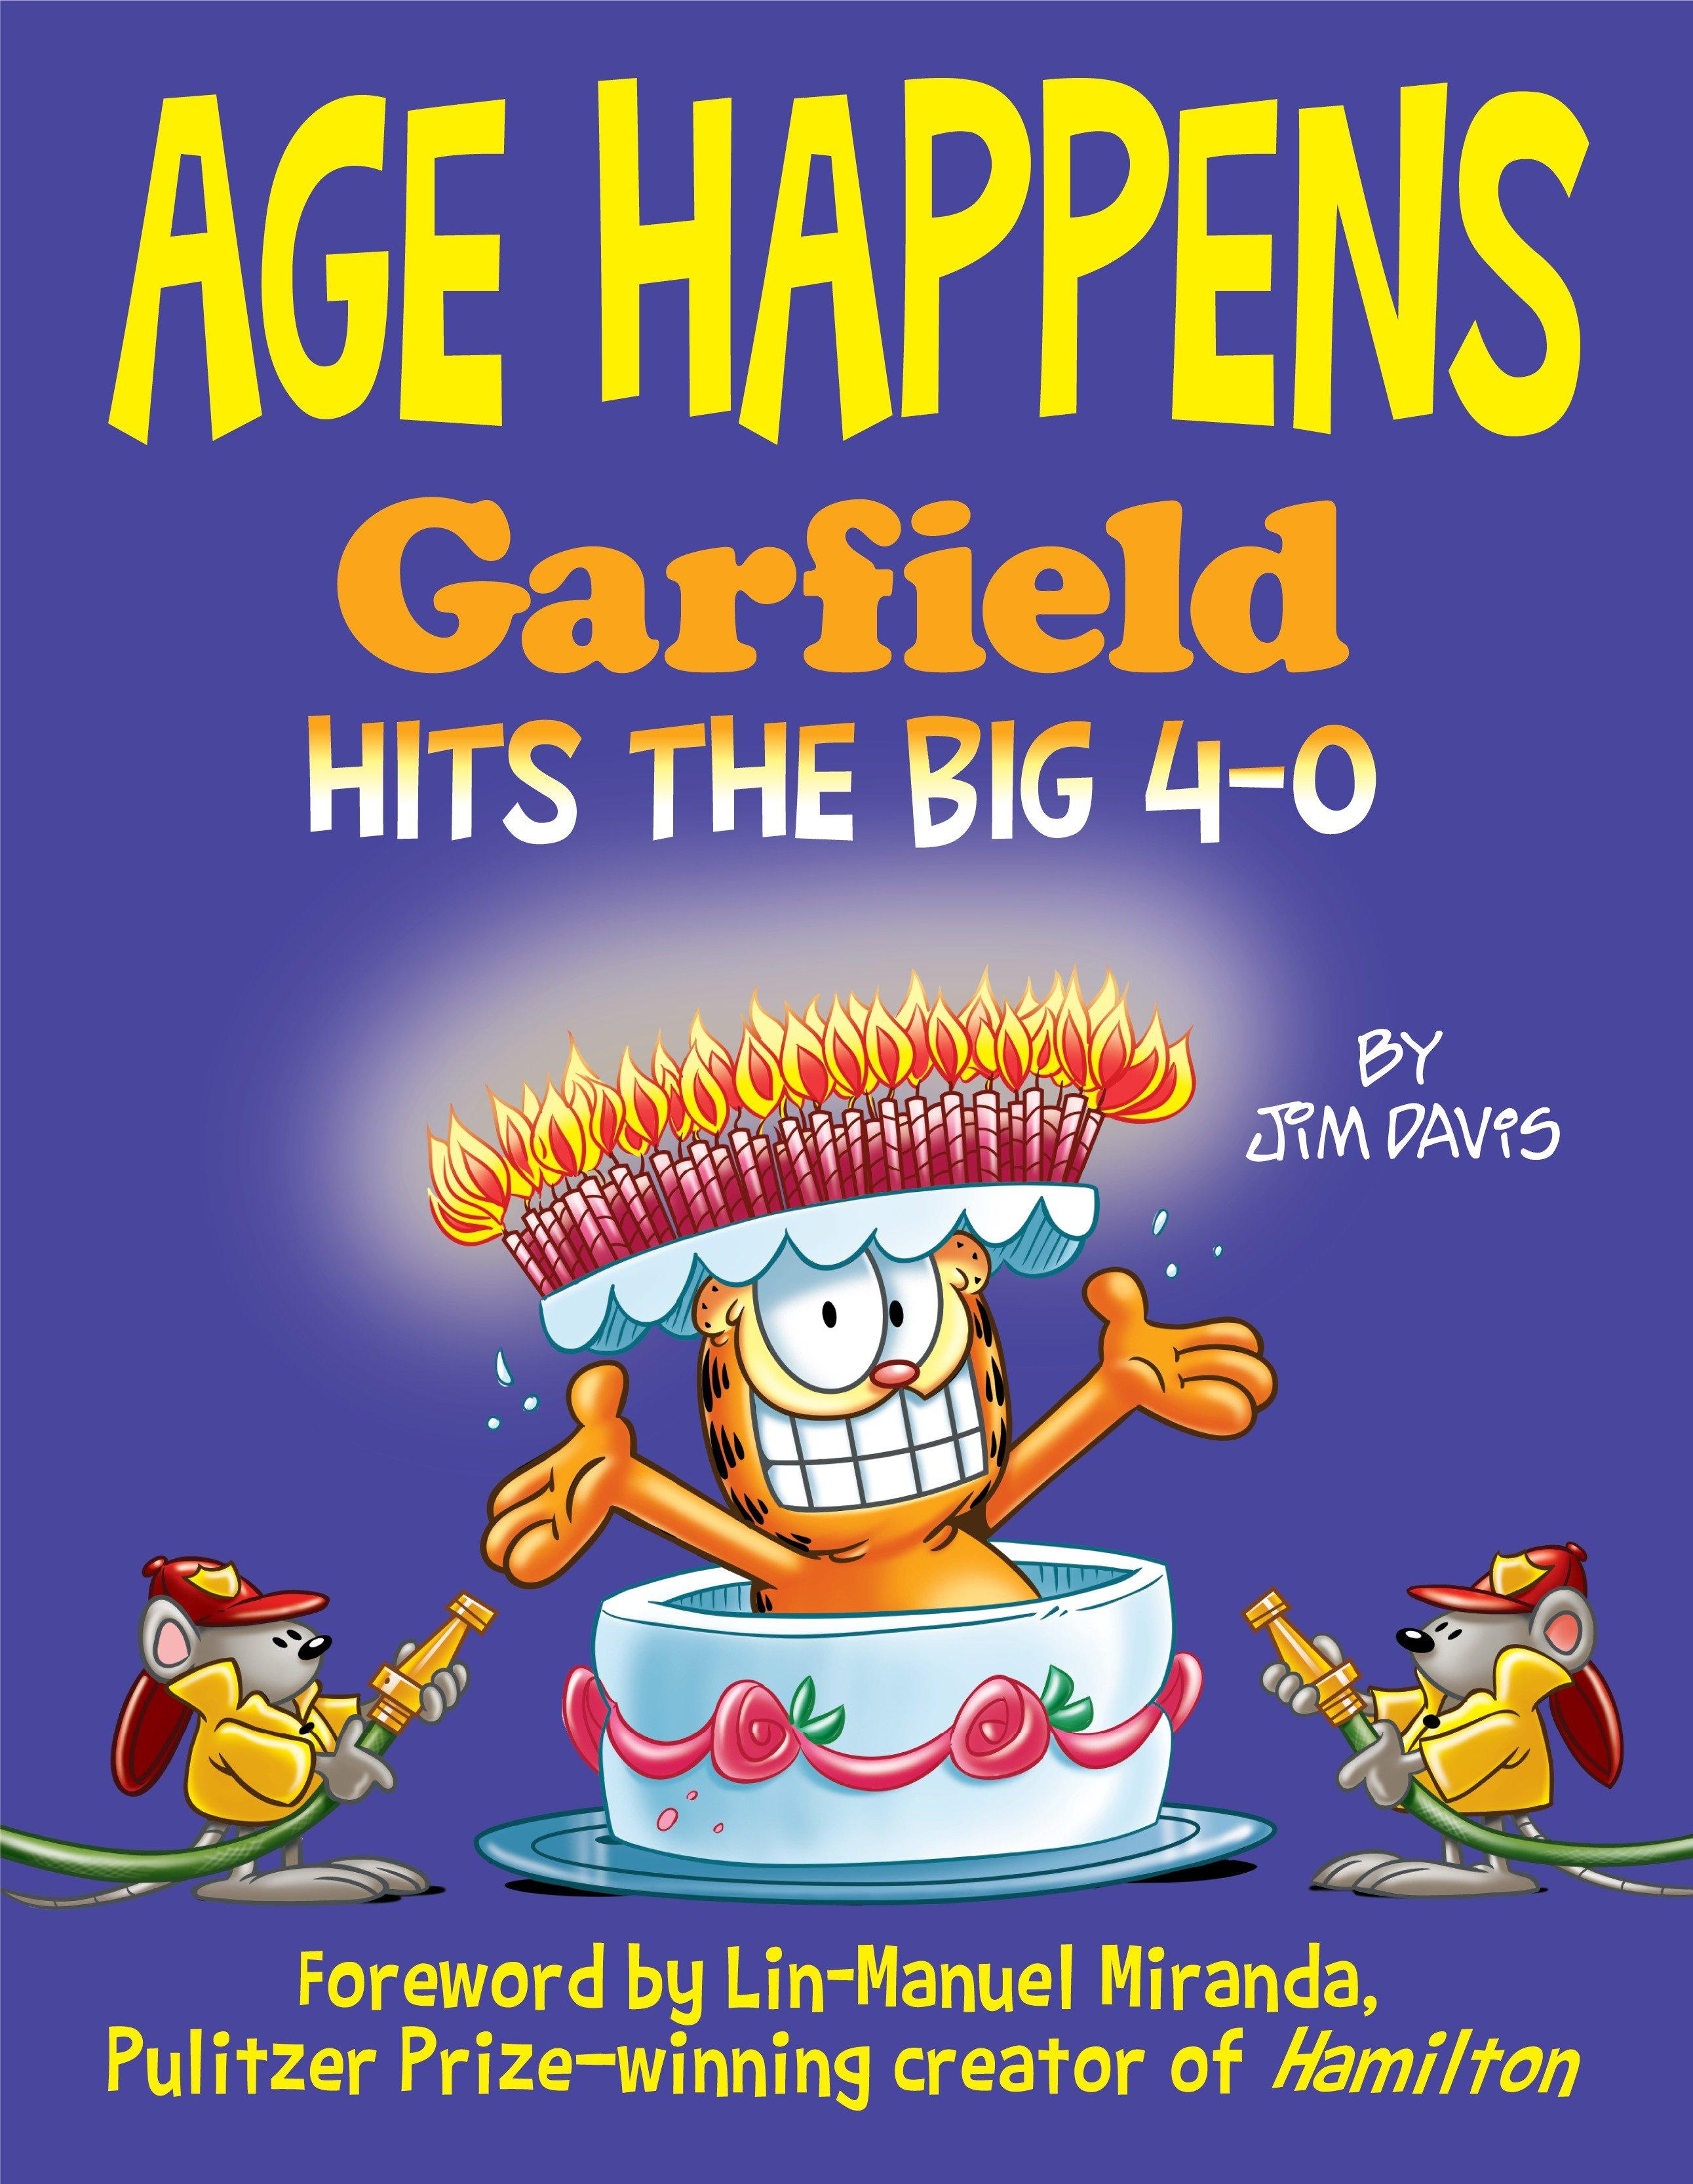 Age Happens Garfield Hits the Big 4-0